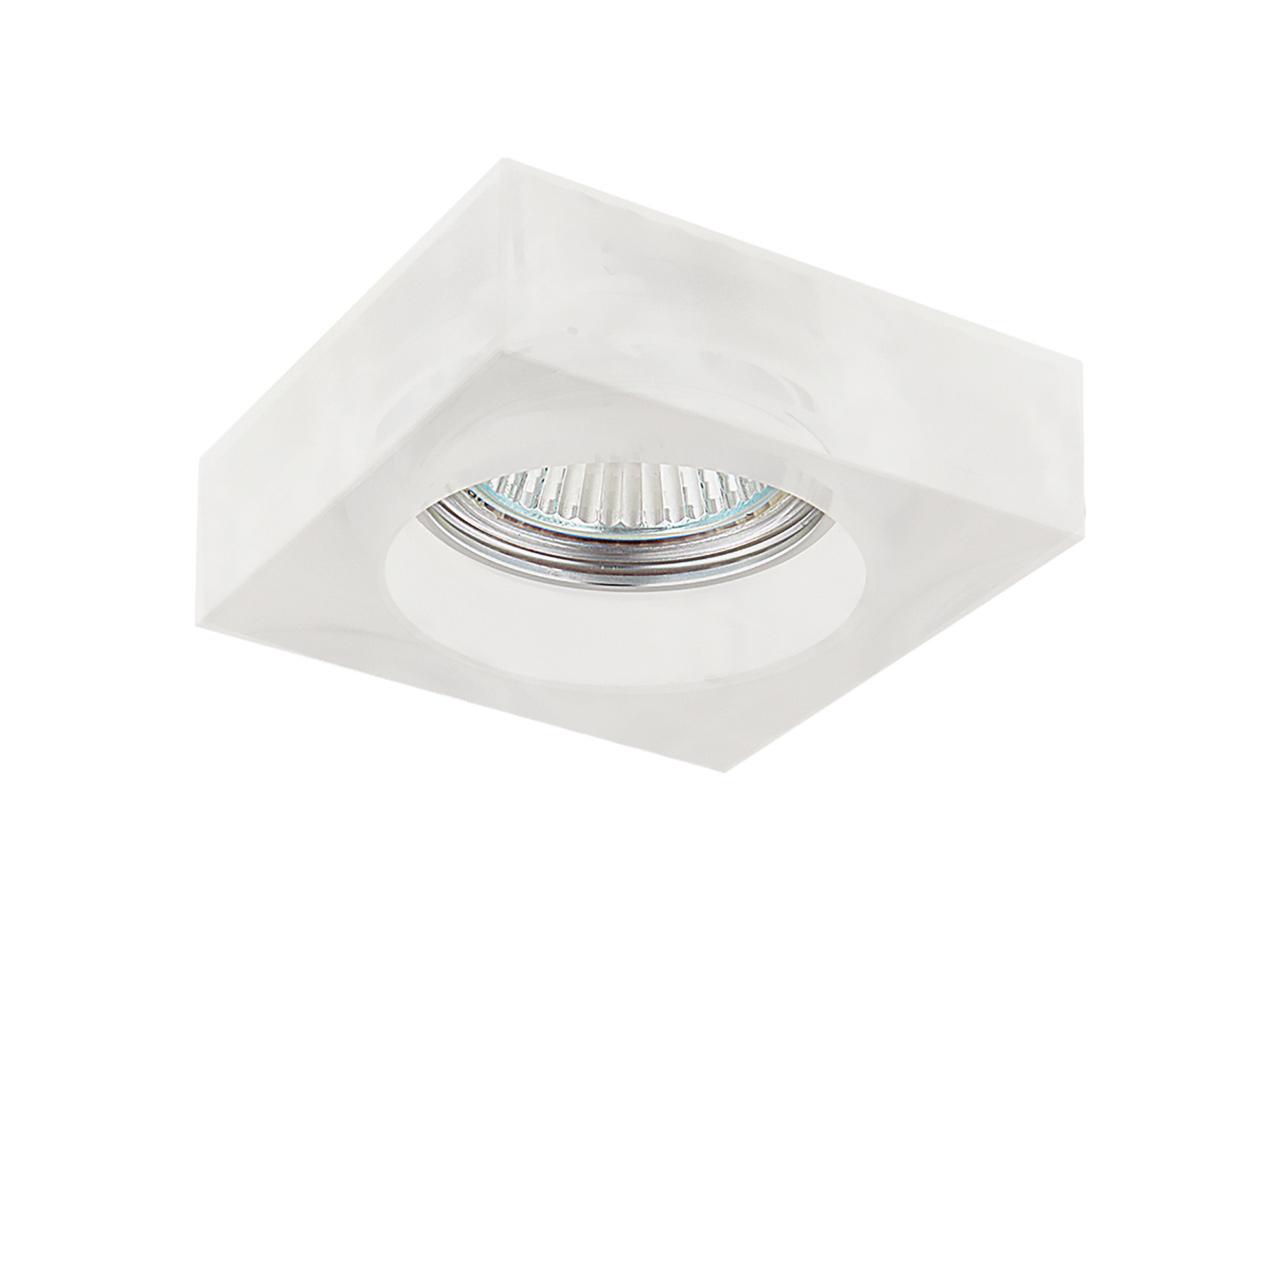 Светильник Lui Mini OPACO MR16 / HP16 хром / матовый Lightstar 006149